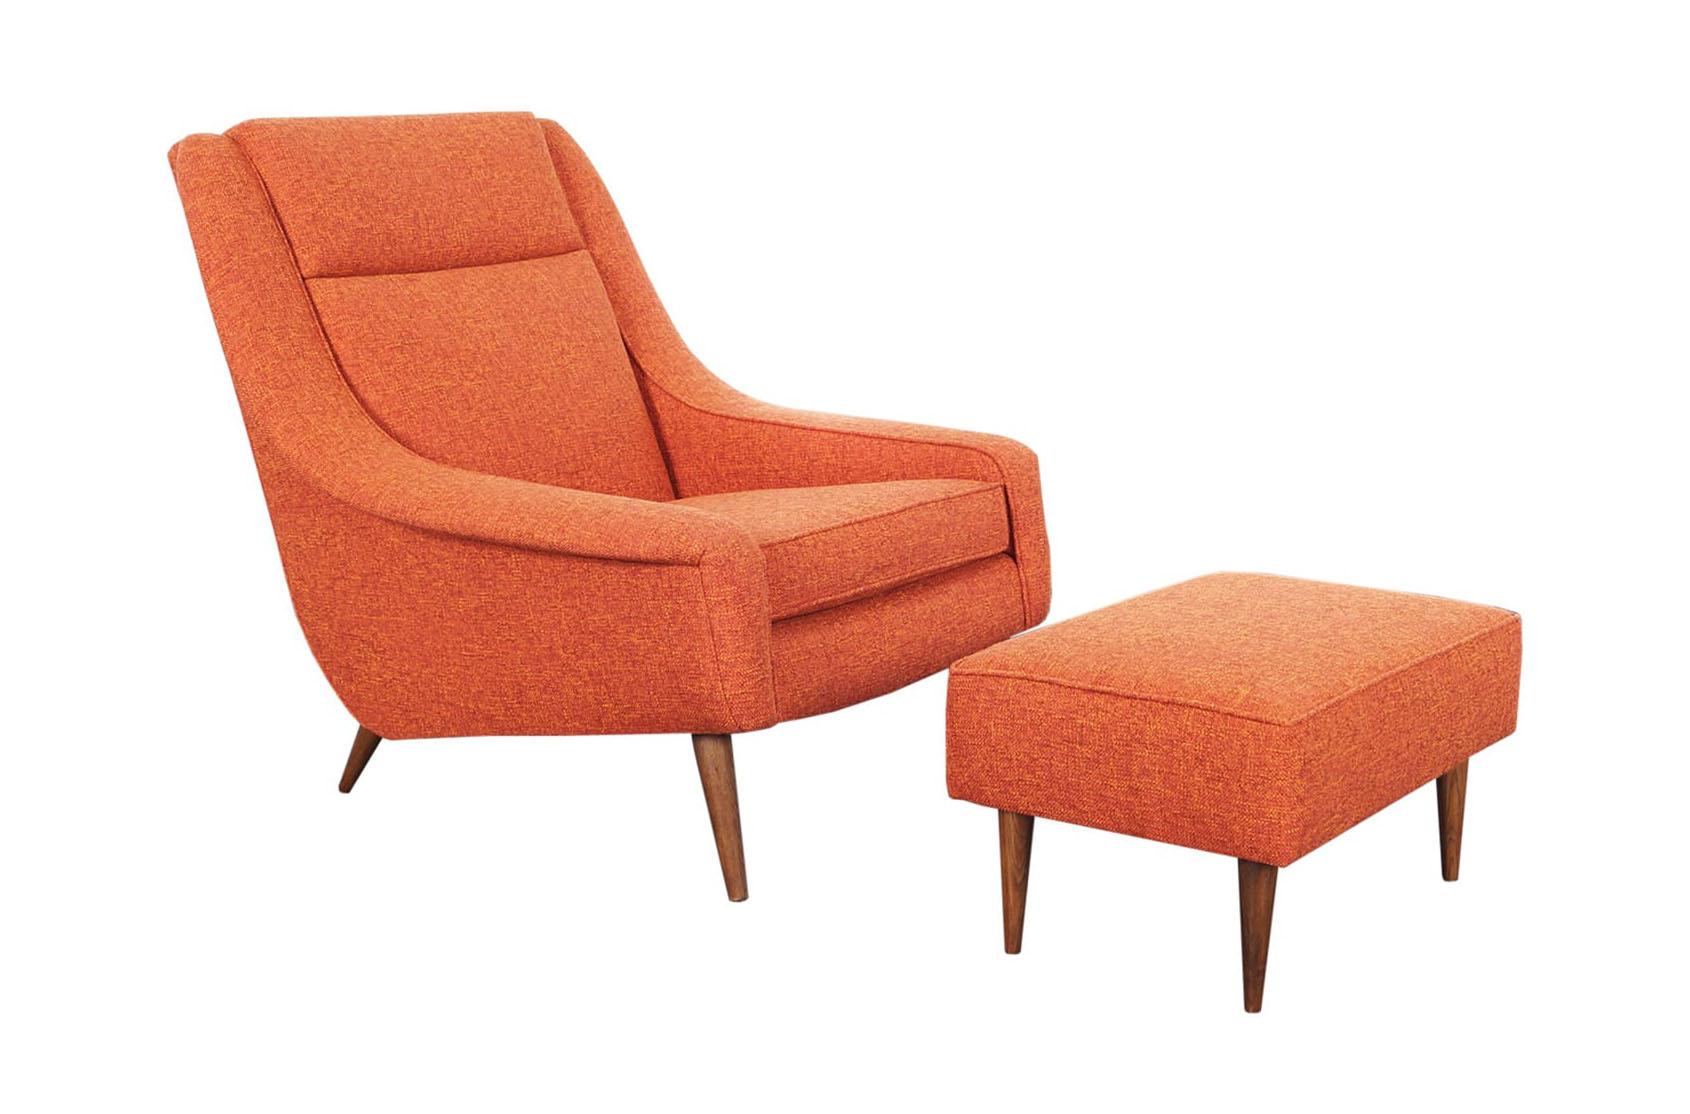 Mid Century Lounge Chair & Ottoman